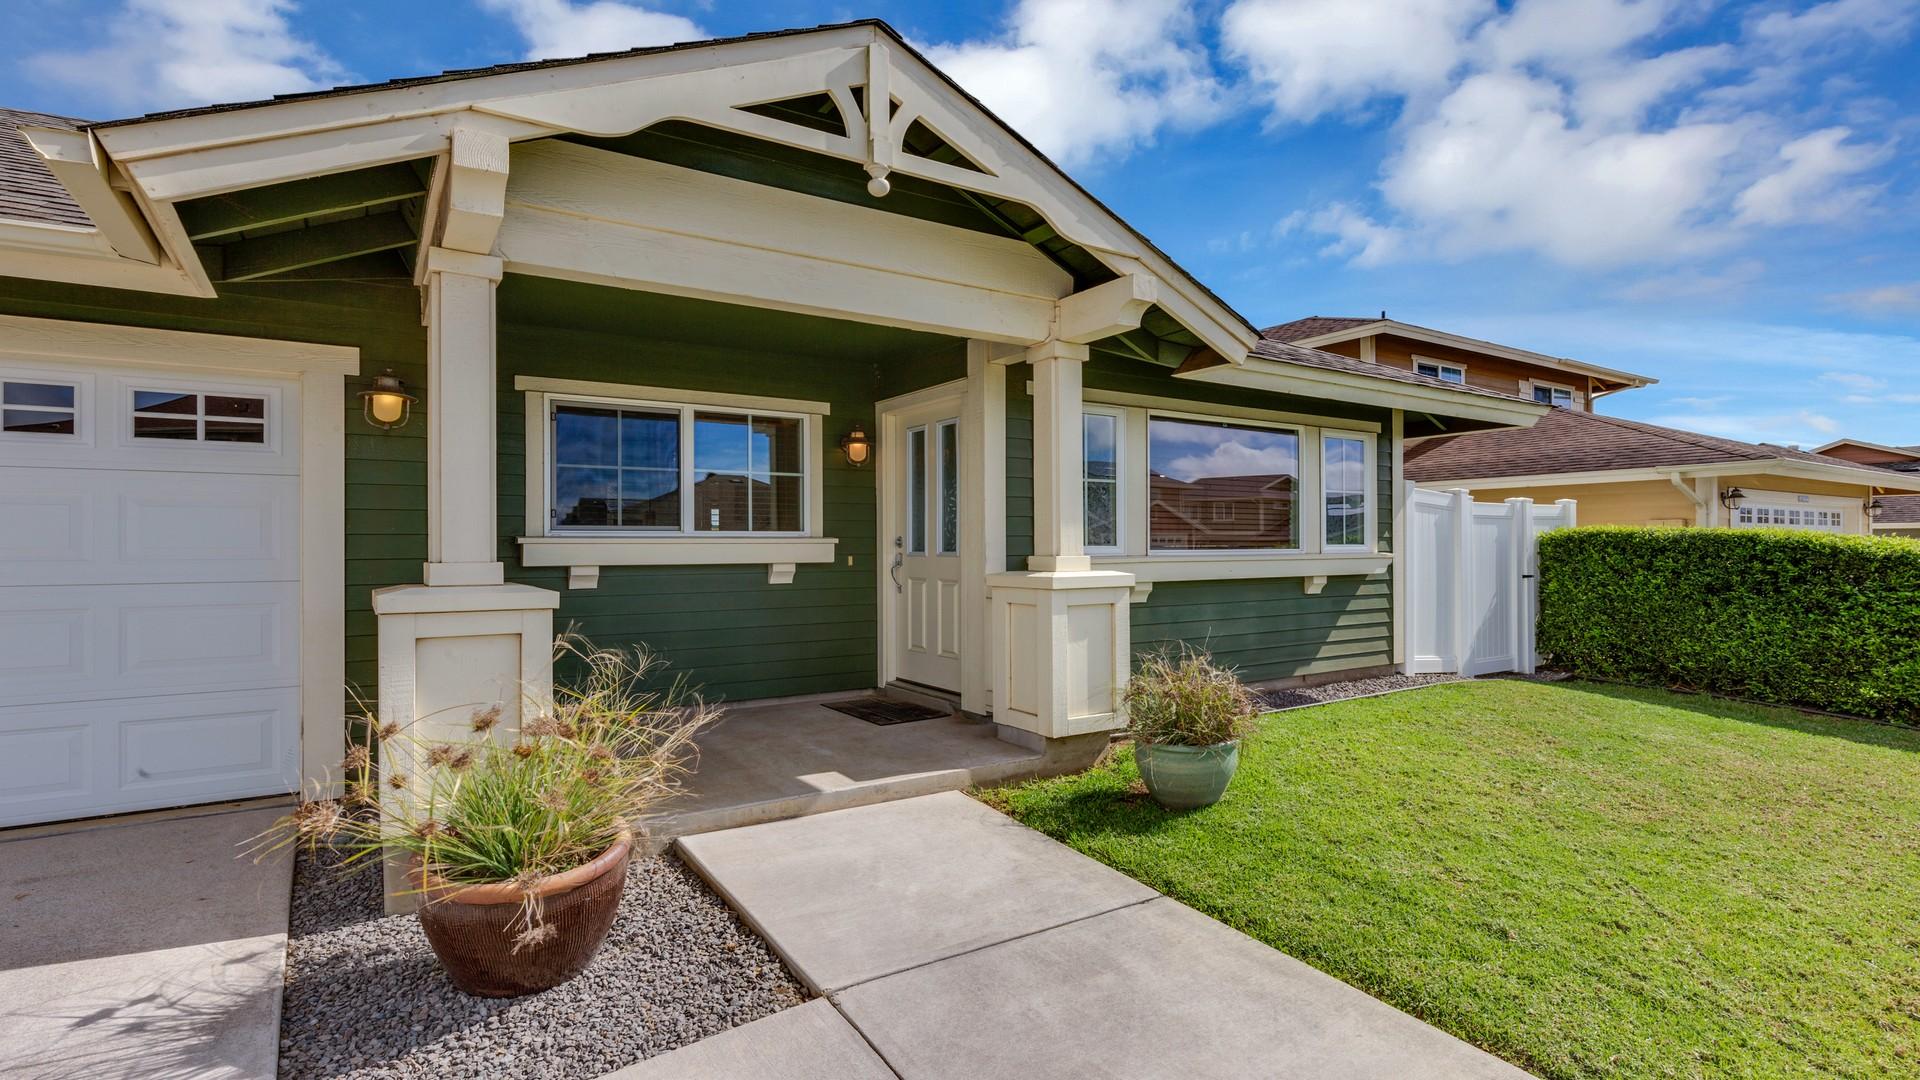 独户住宅 为 销售 在 Lualai at Parker Ranch 67-1236 Puehale Pl 卡姆艾拉, 夏威夷 96743 美国